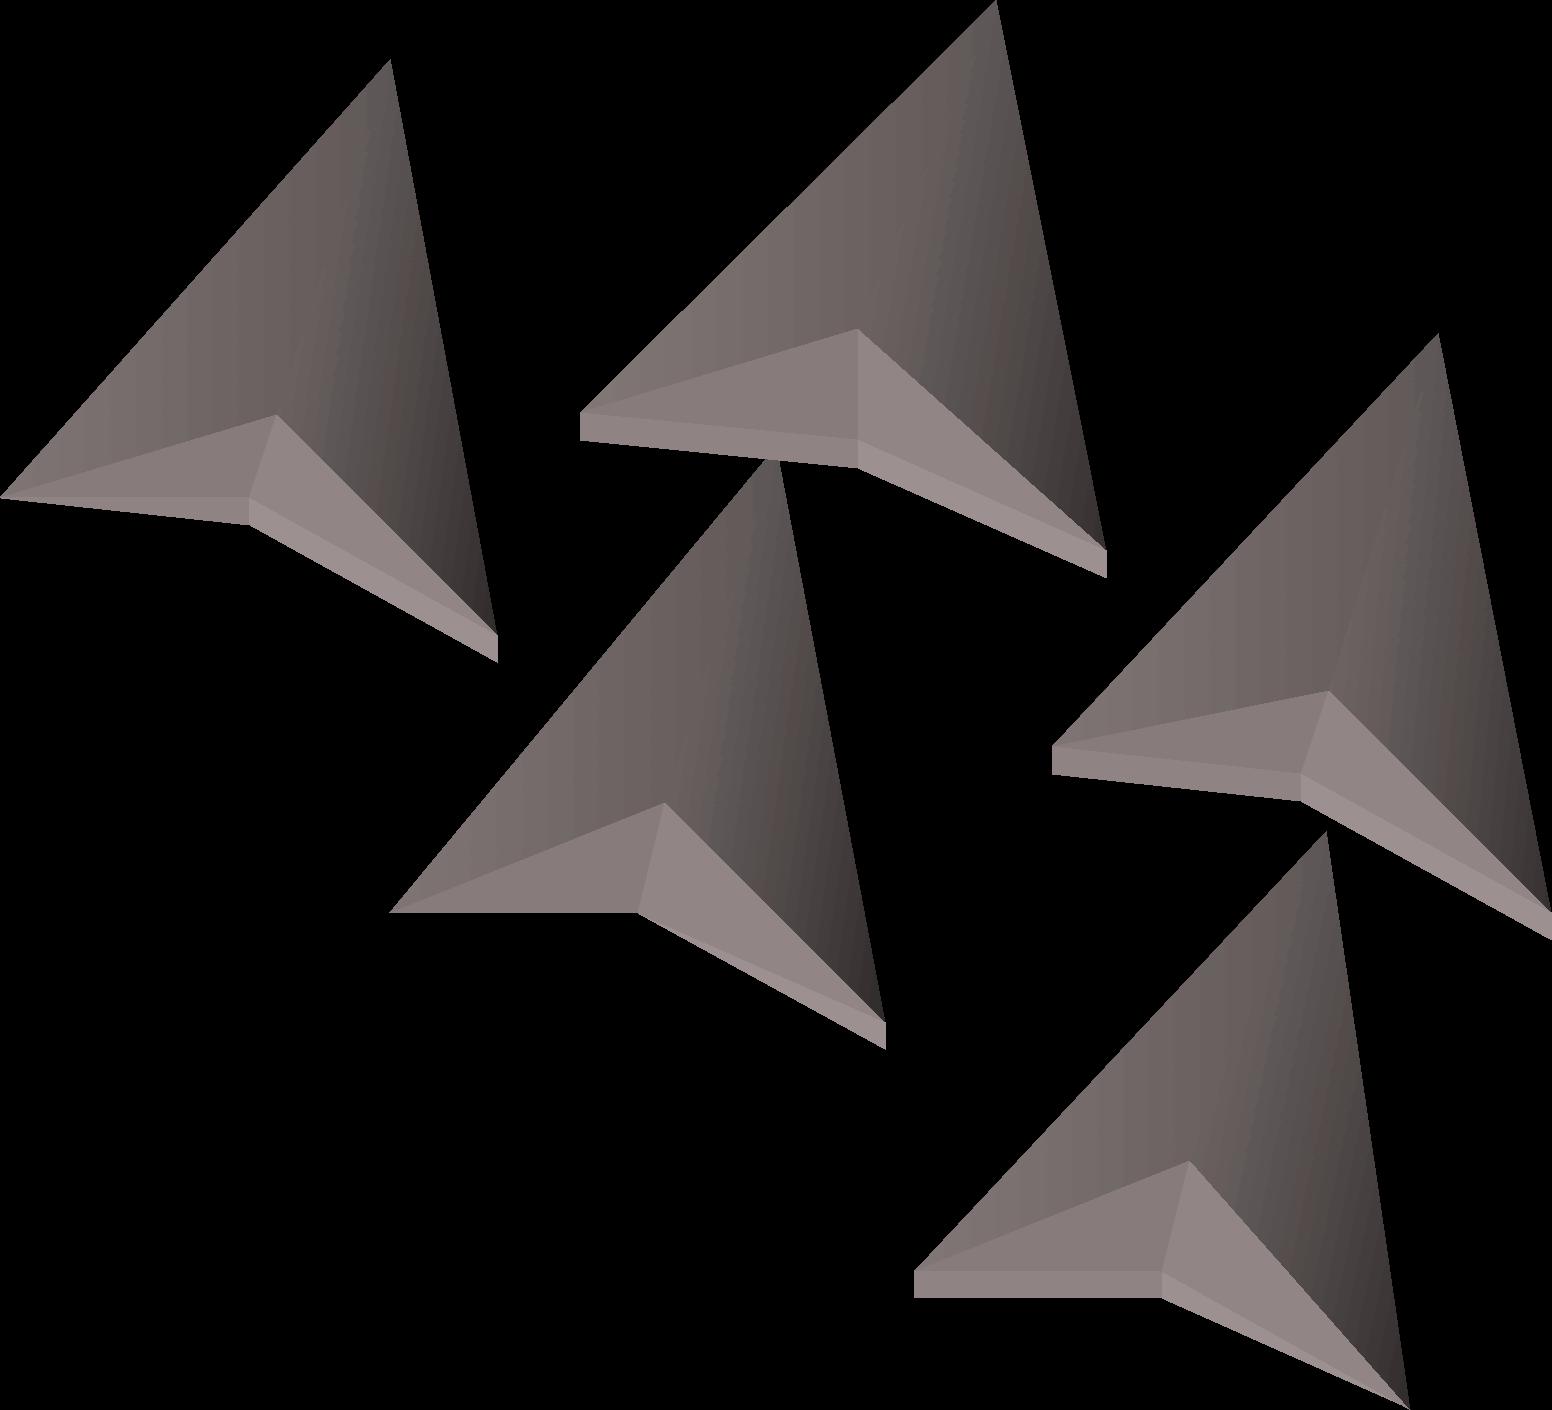 Broad, one of the best arrows in Old School RuneScape